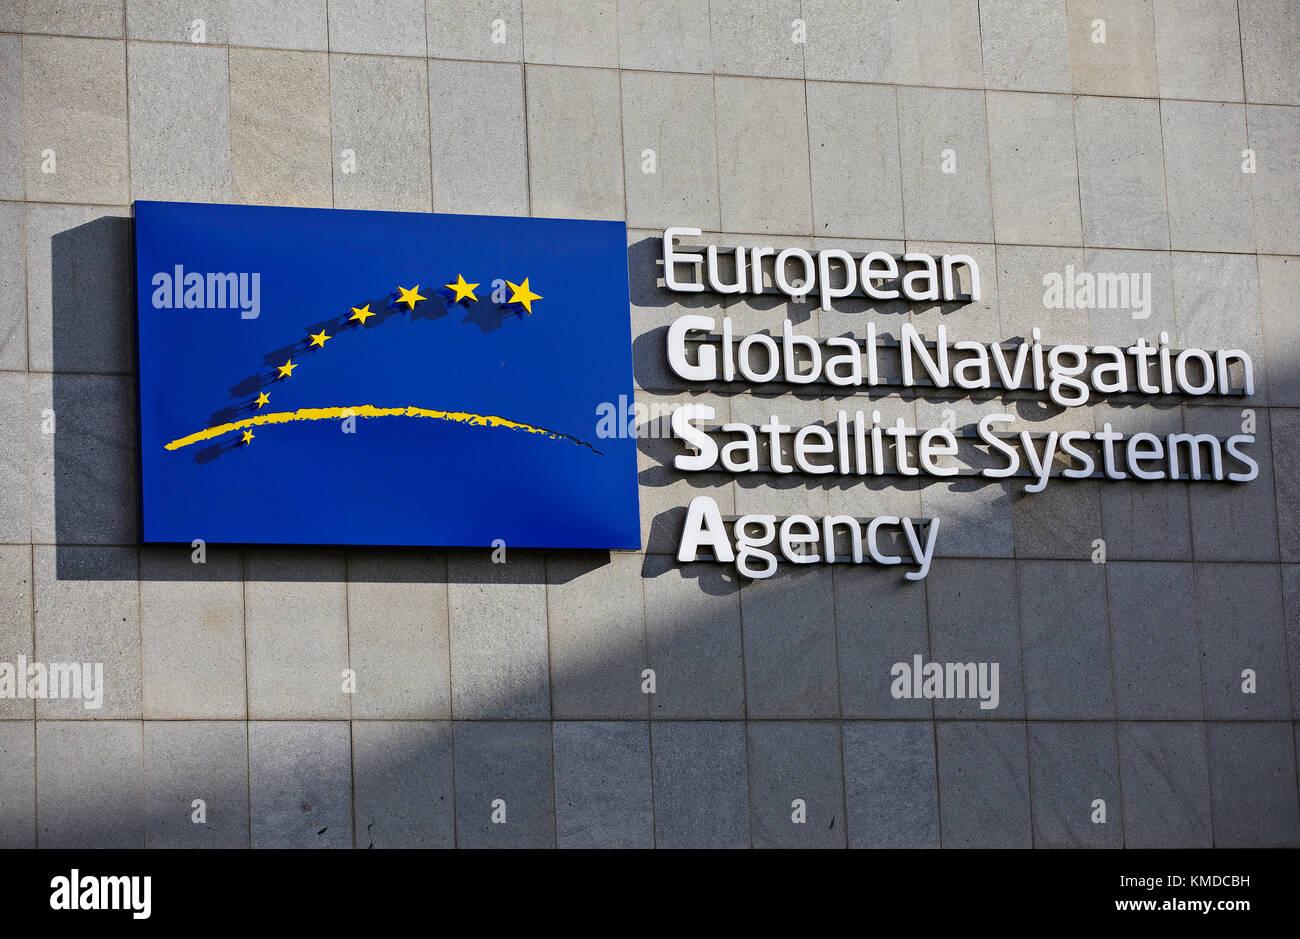 European GNSS Agency, GSA - European Global Navigation Satellite Systems Agency - Stock Image